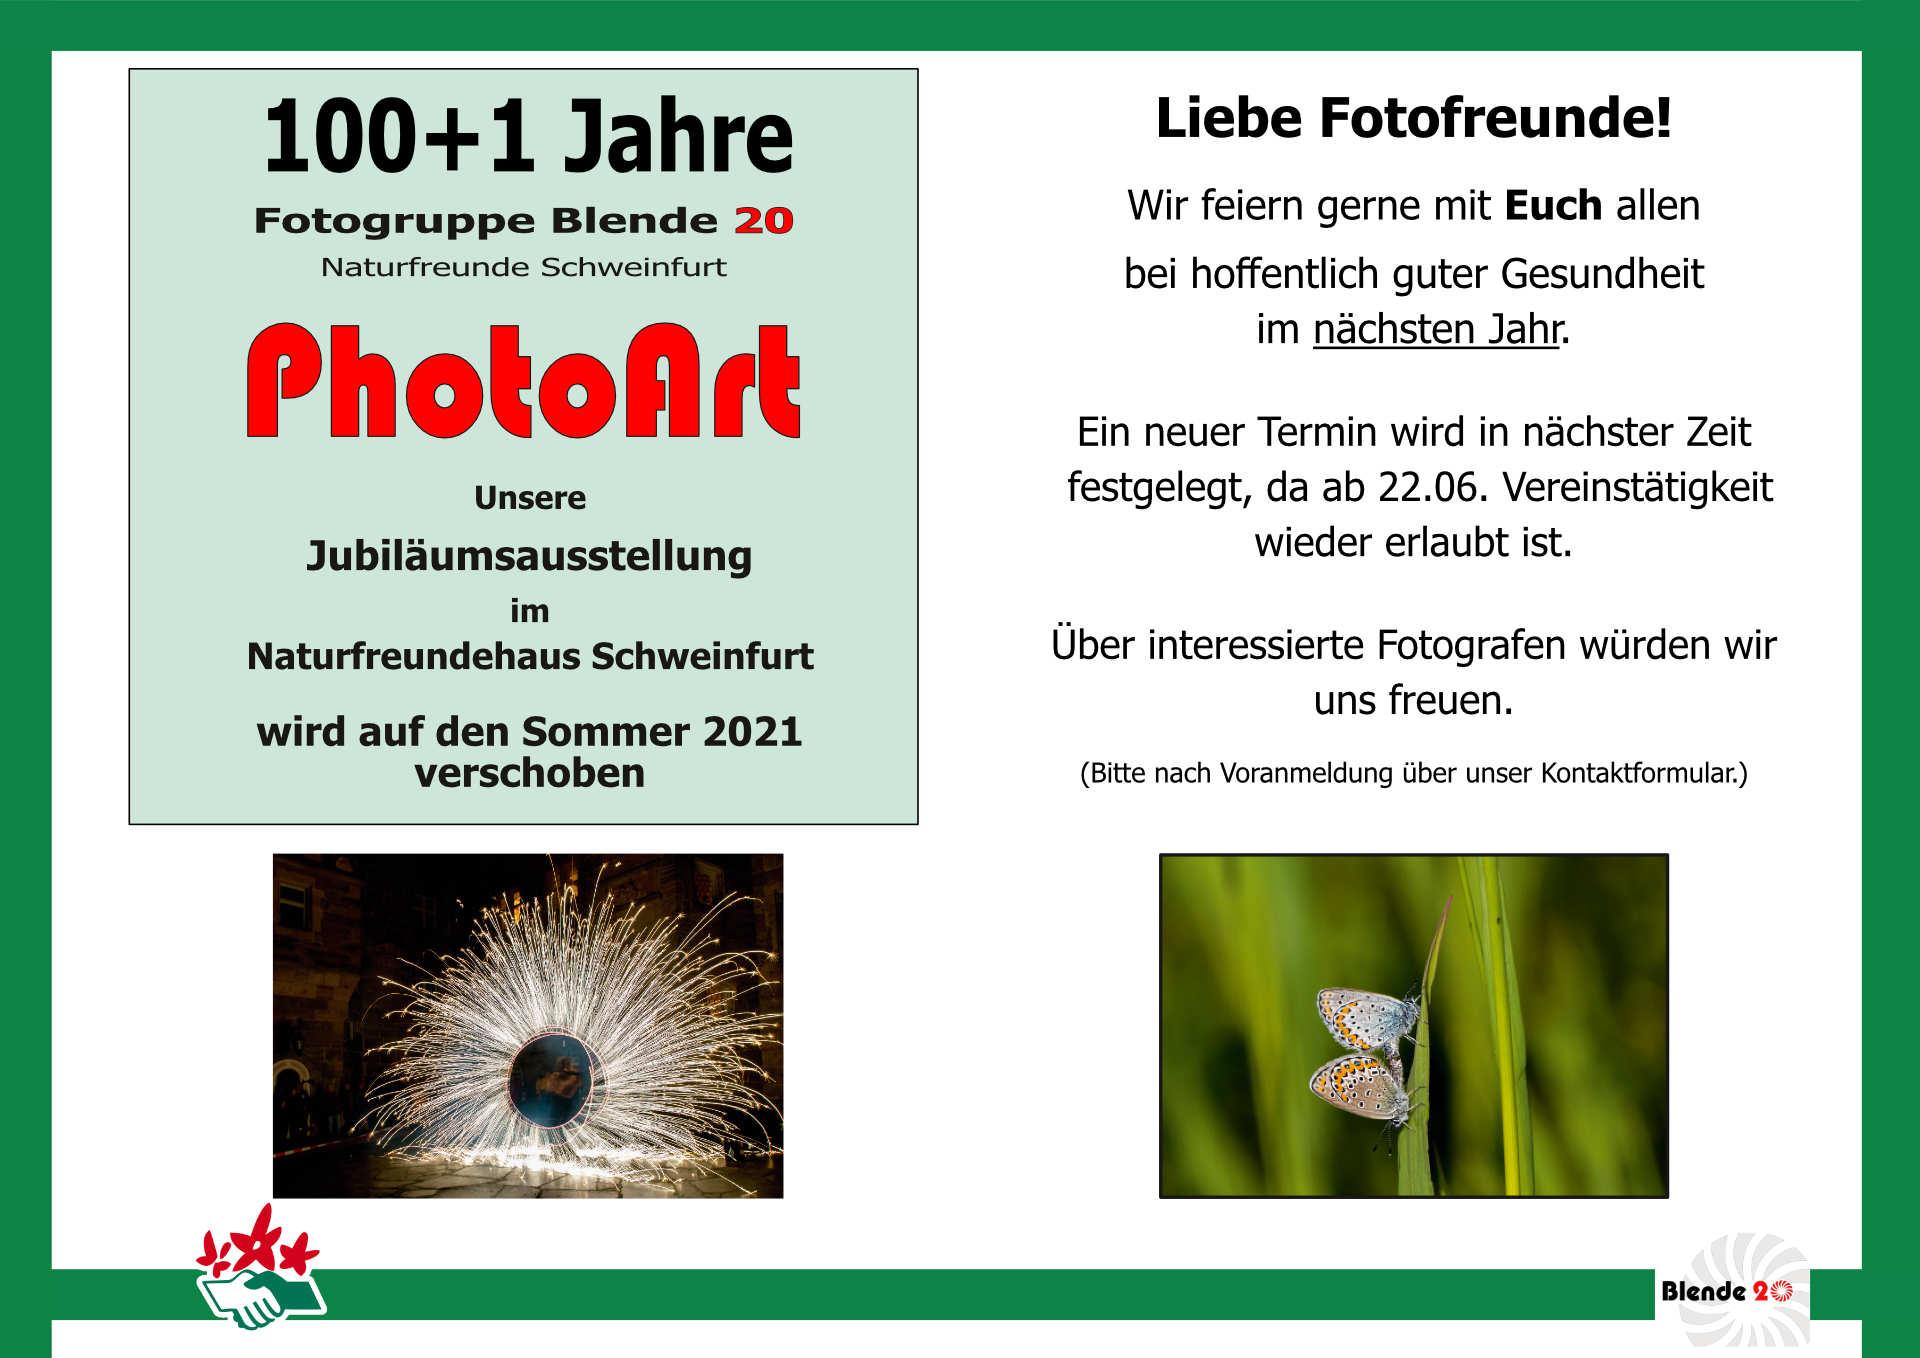 Ausstellung 100+1 Jahre Fotogruppe der Naturfreunde Schweinfurt